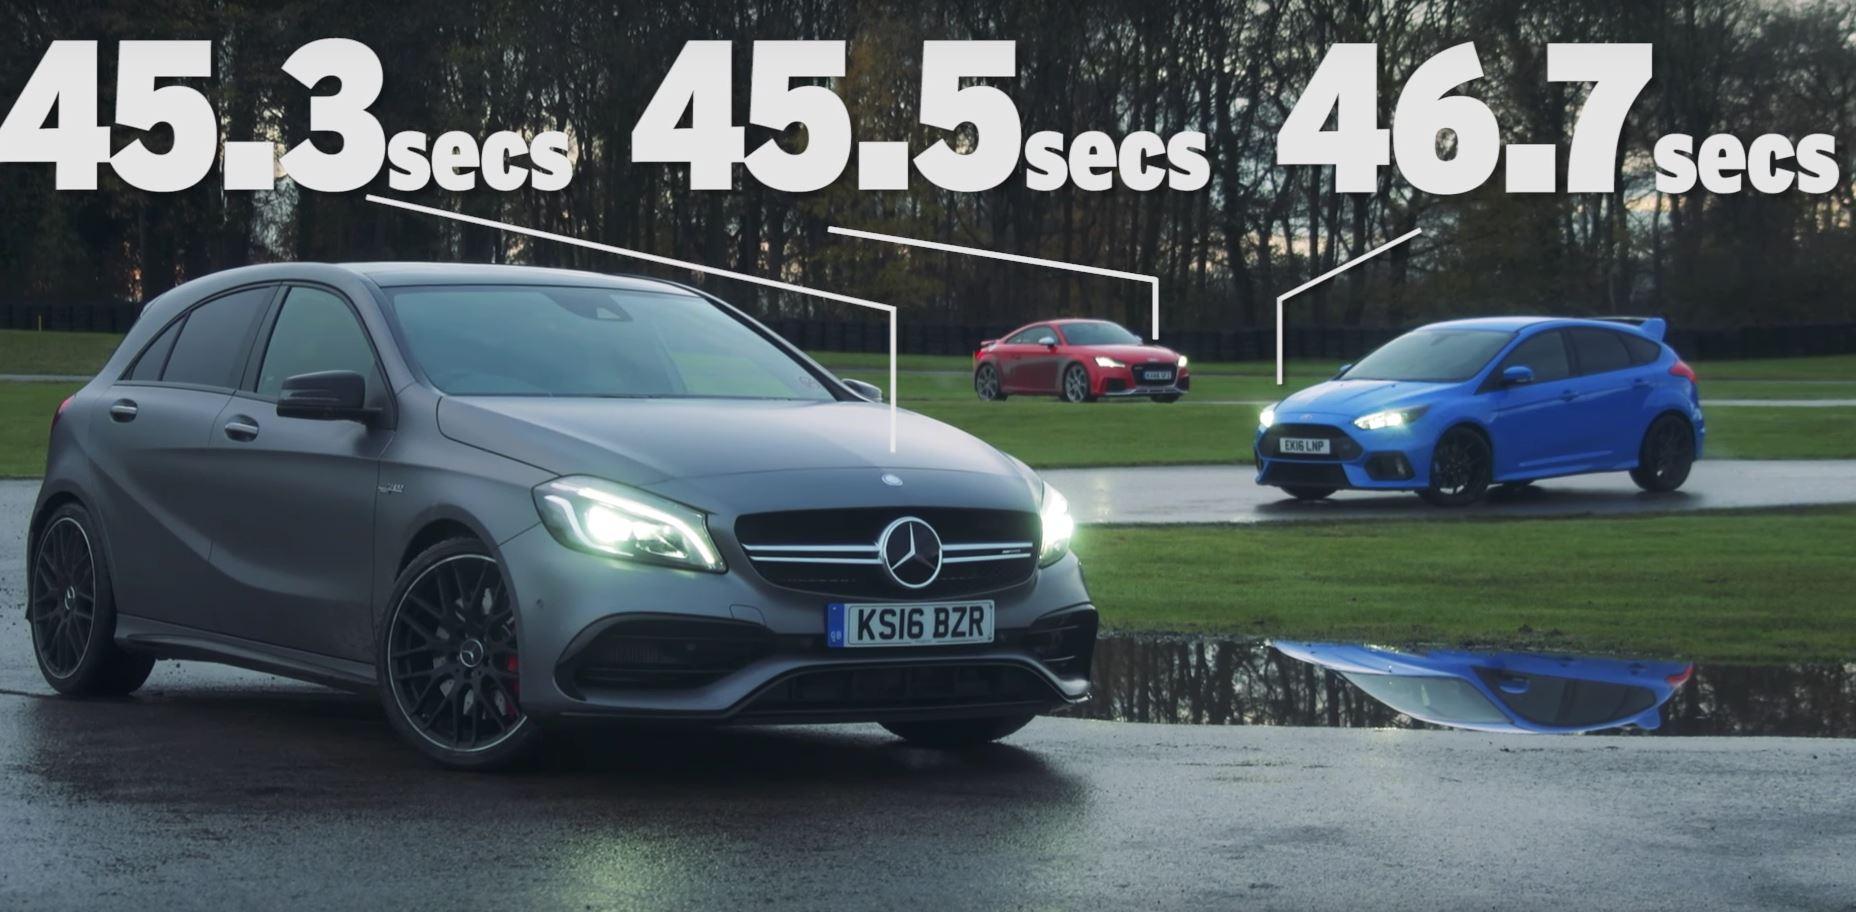 Audi TT RS vs. Mercedes-AMG A45 vs. Ford Focus RS